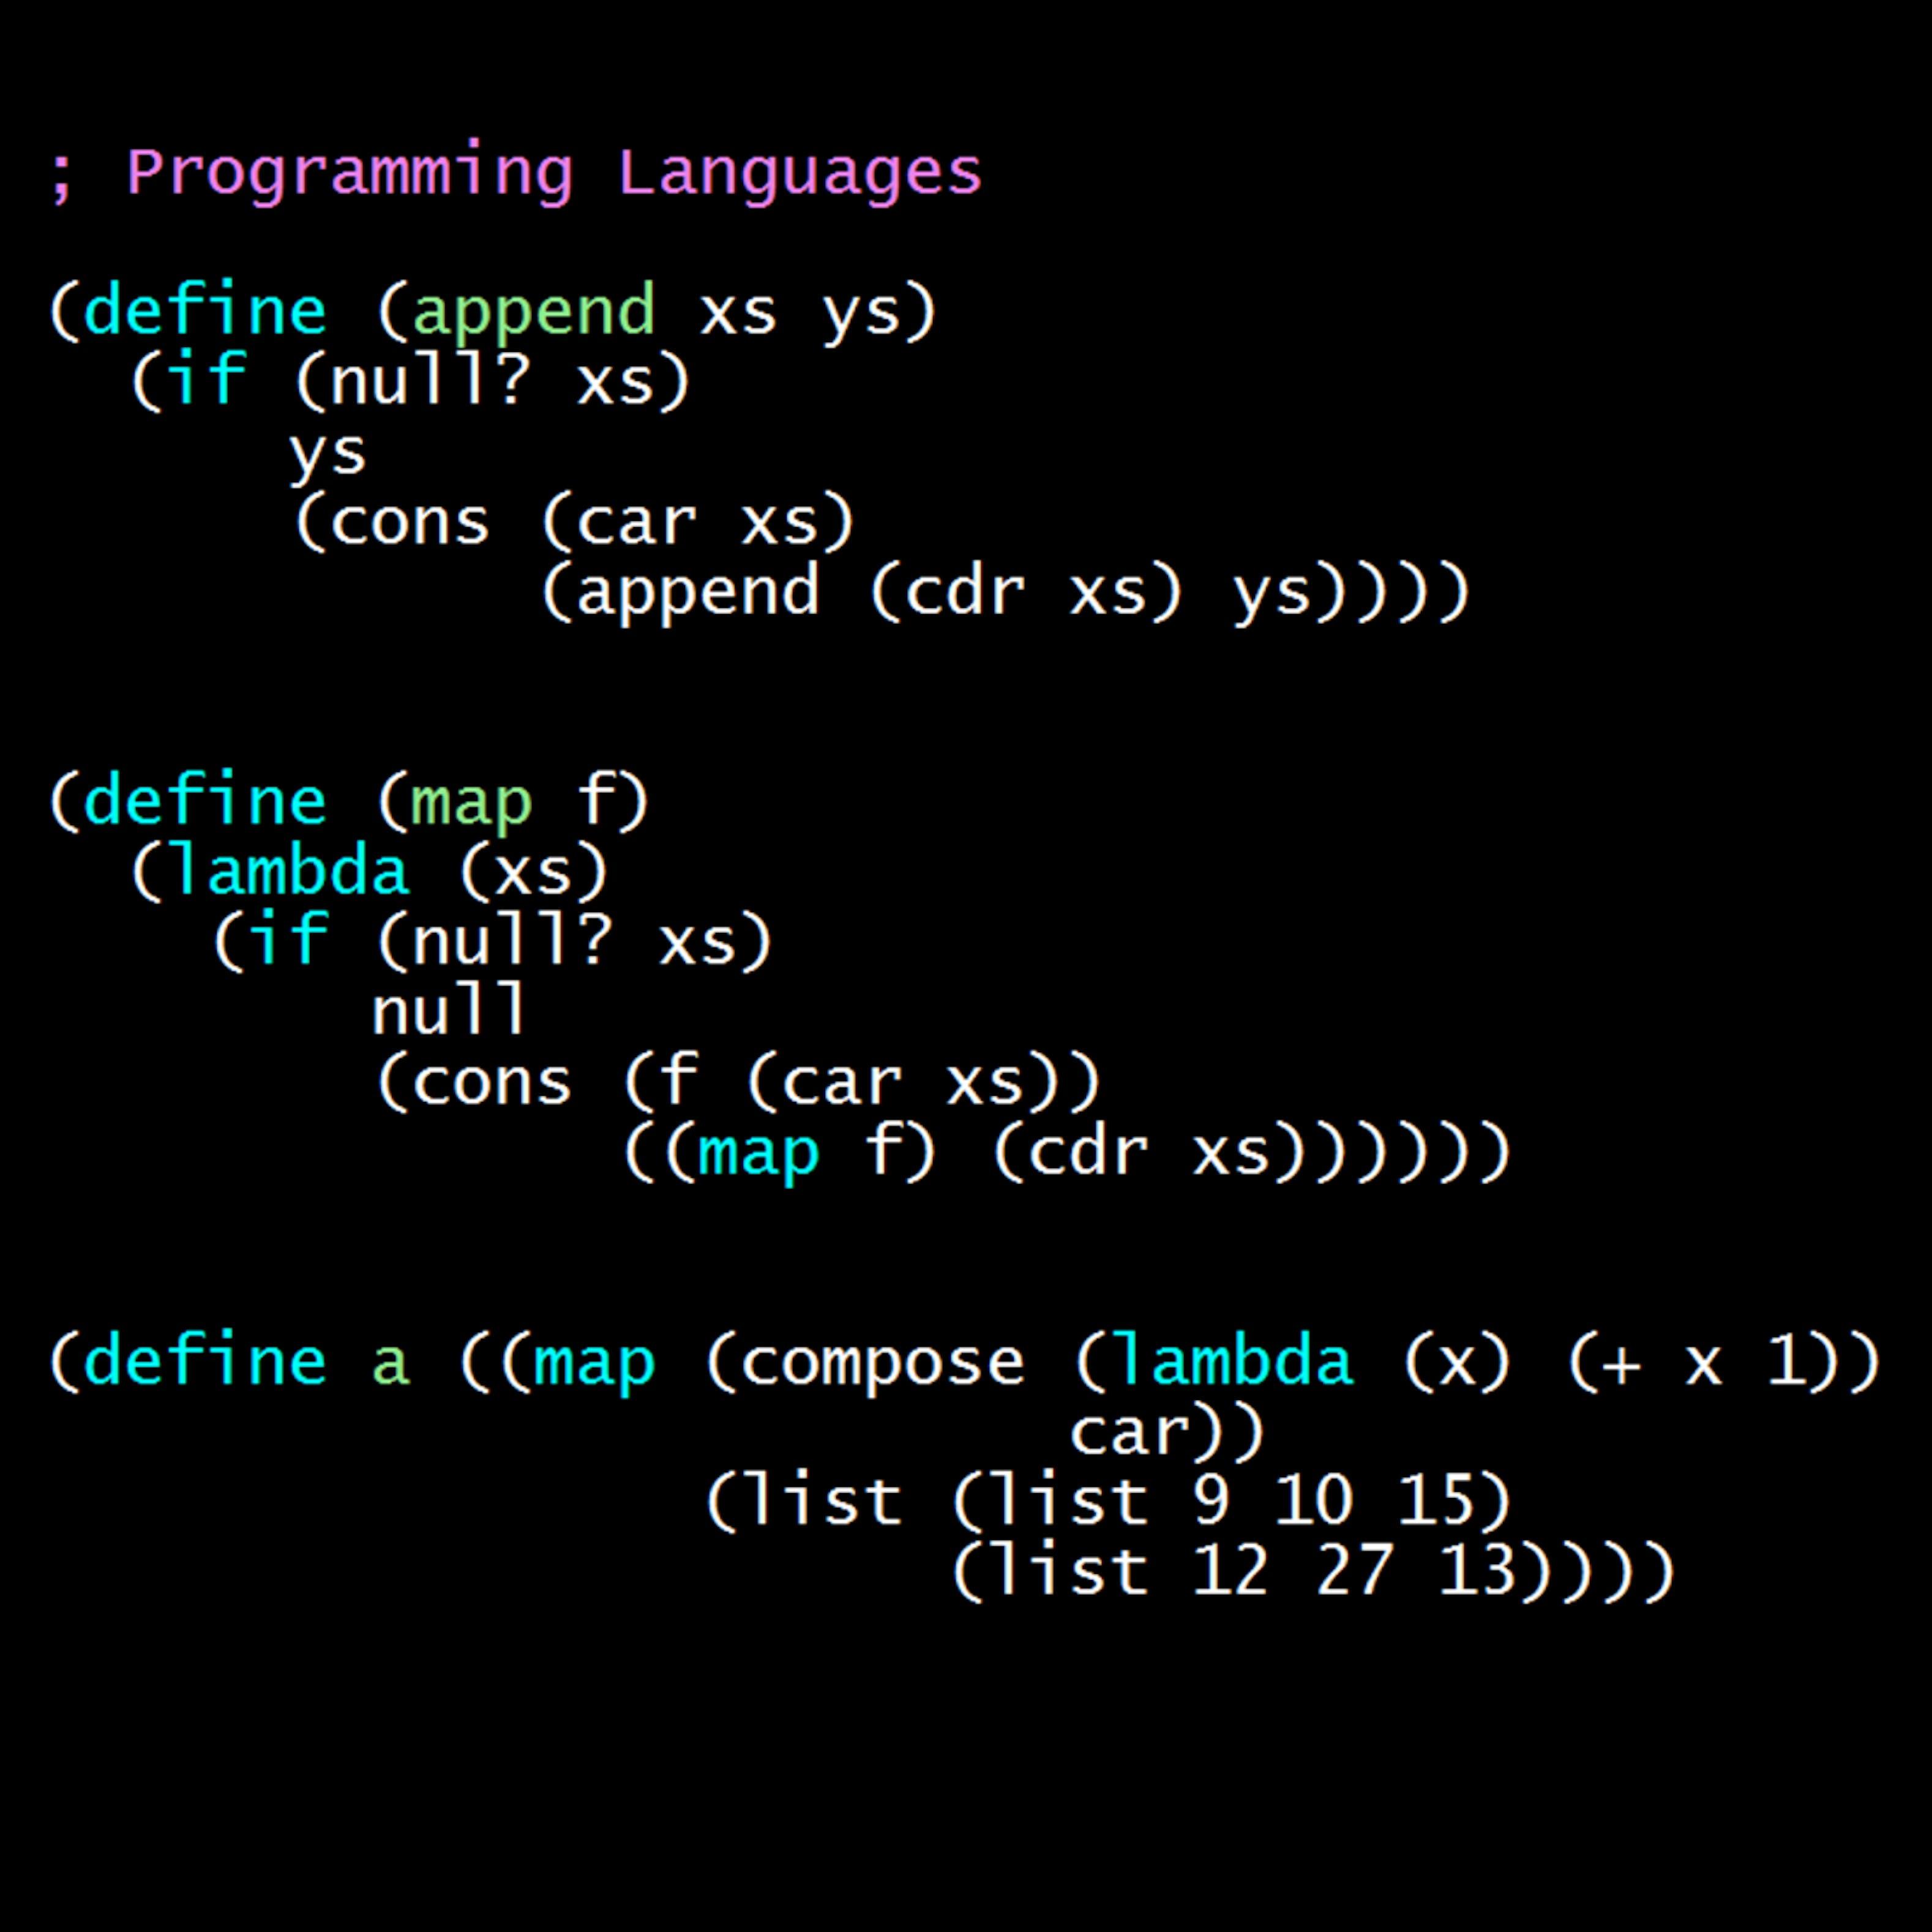 Programming Languages, Part B | Coursera